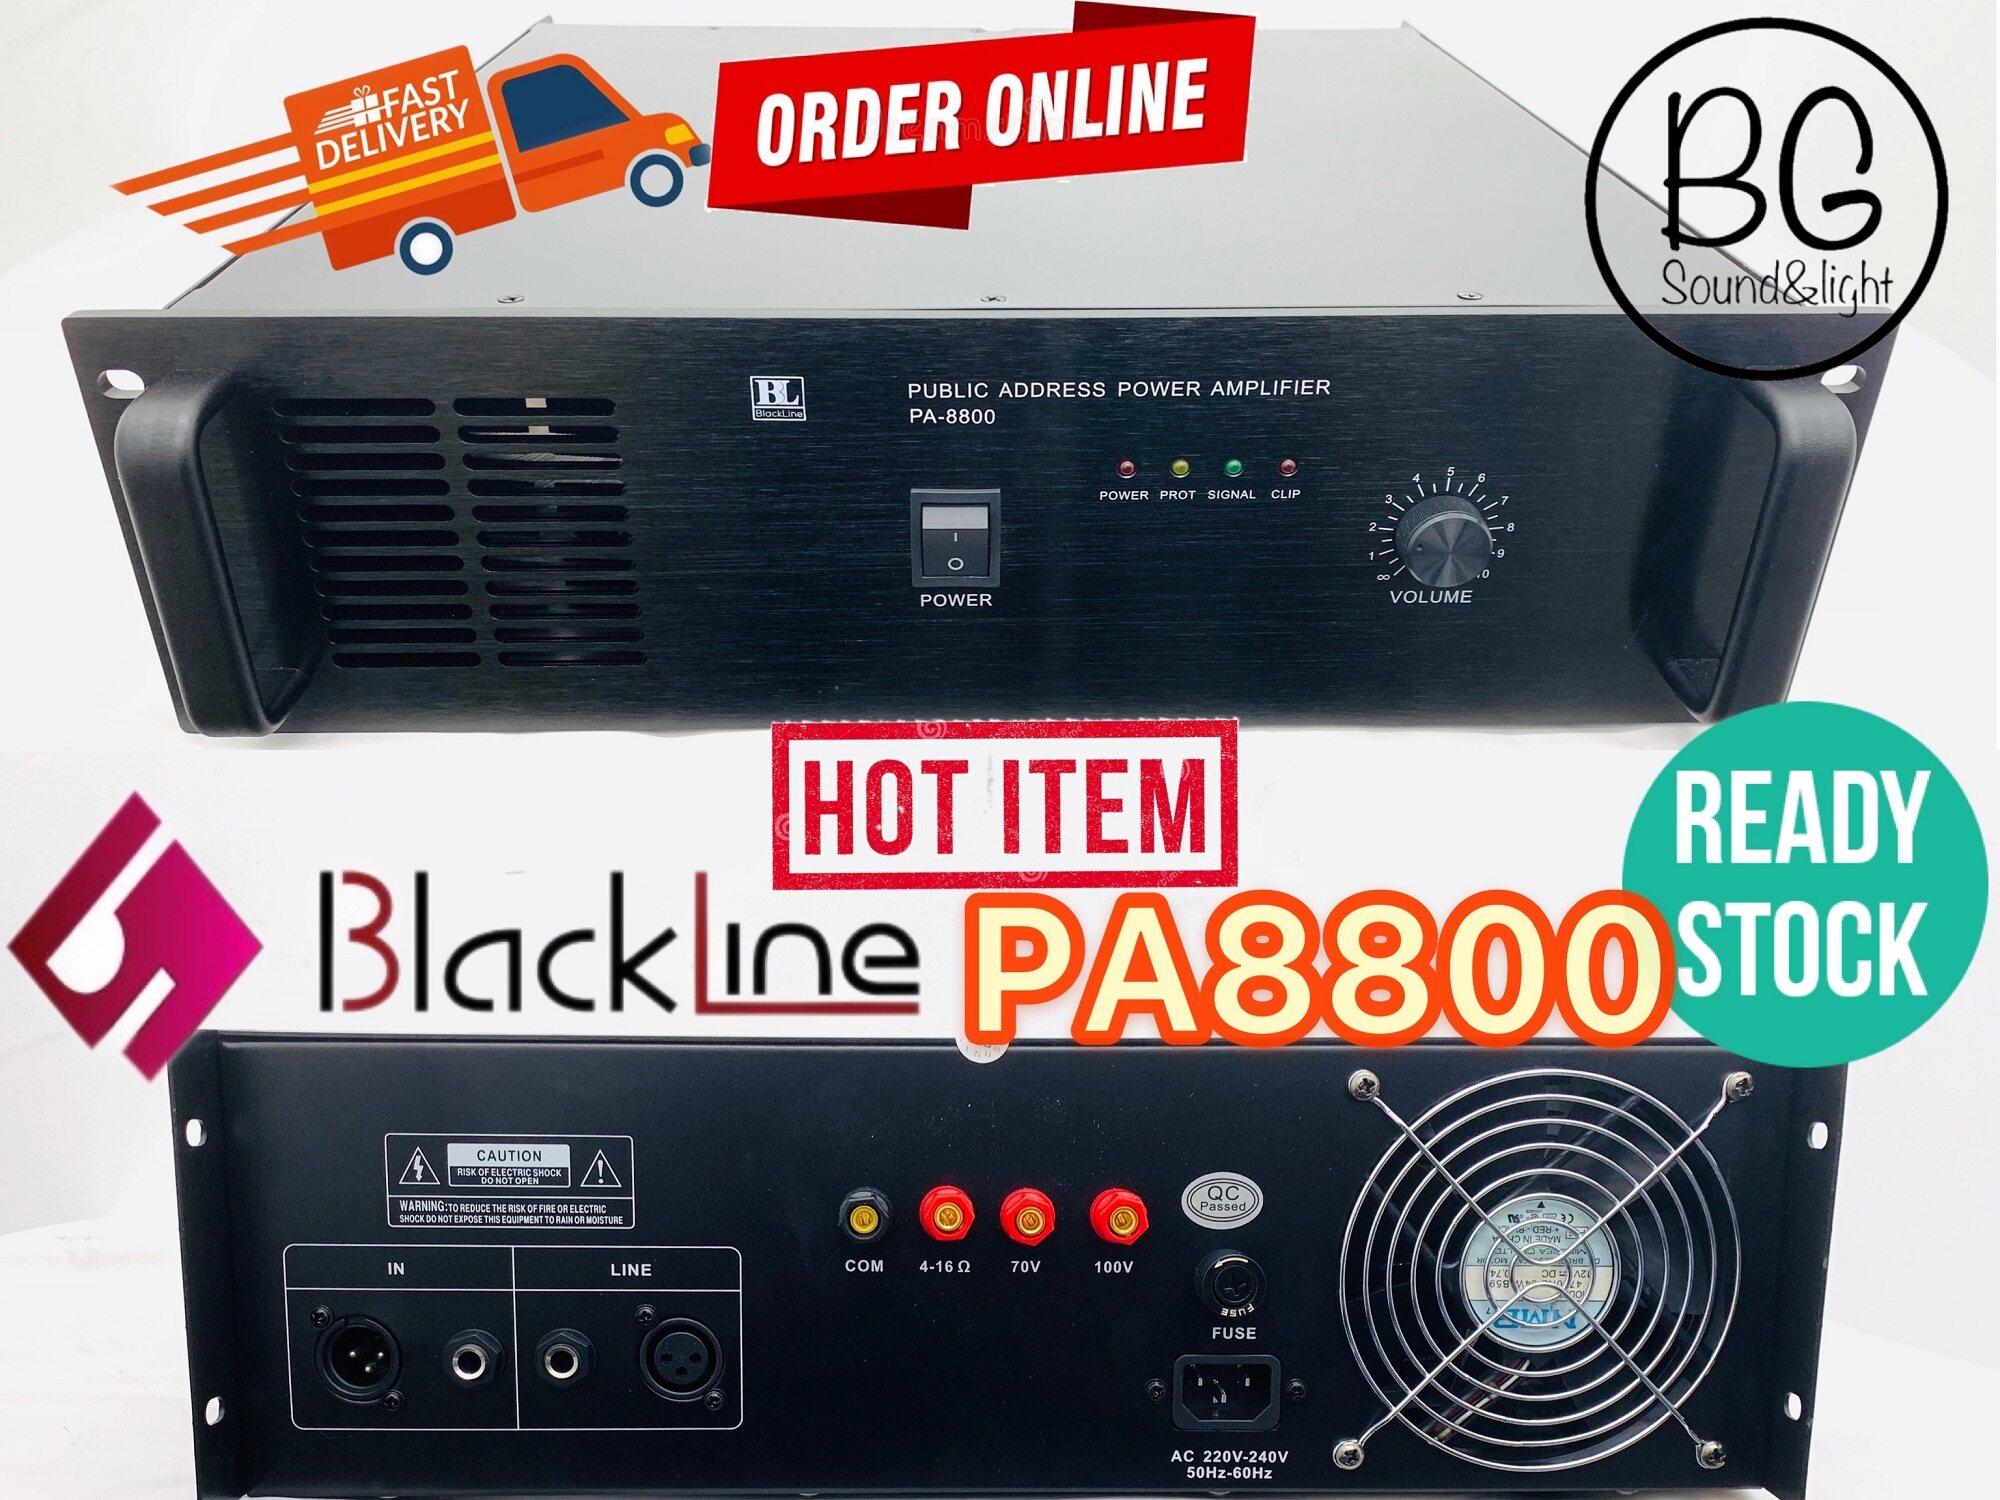 [Ready Stock]Blackline PA8800 800W Public Address PA System Power Amplifier